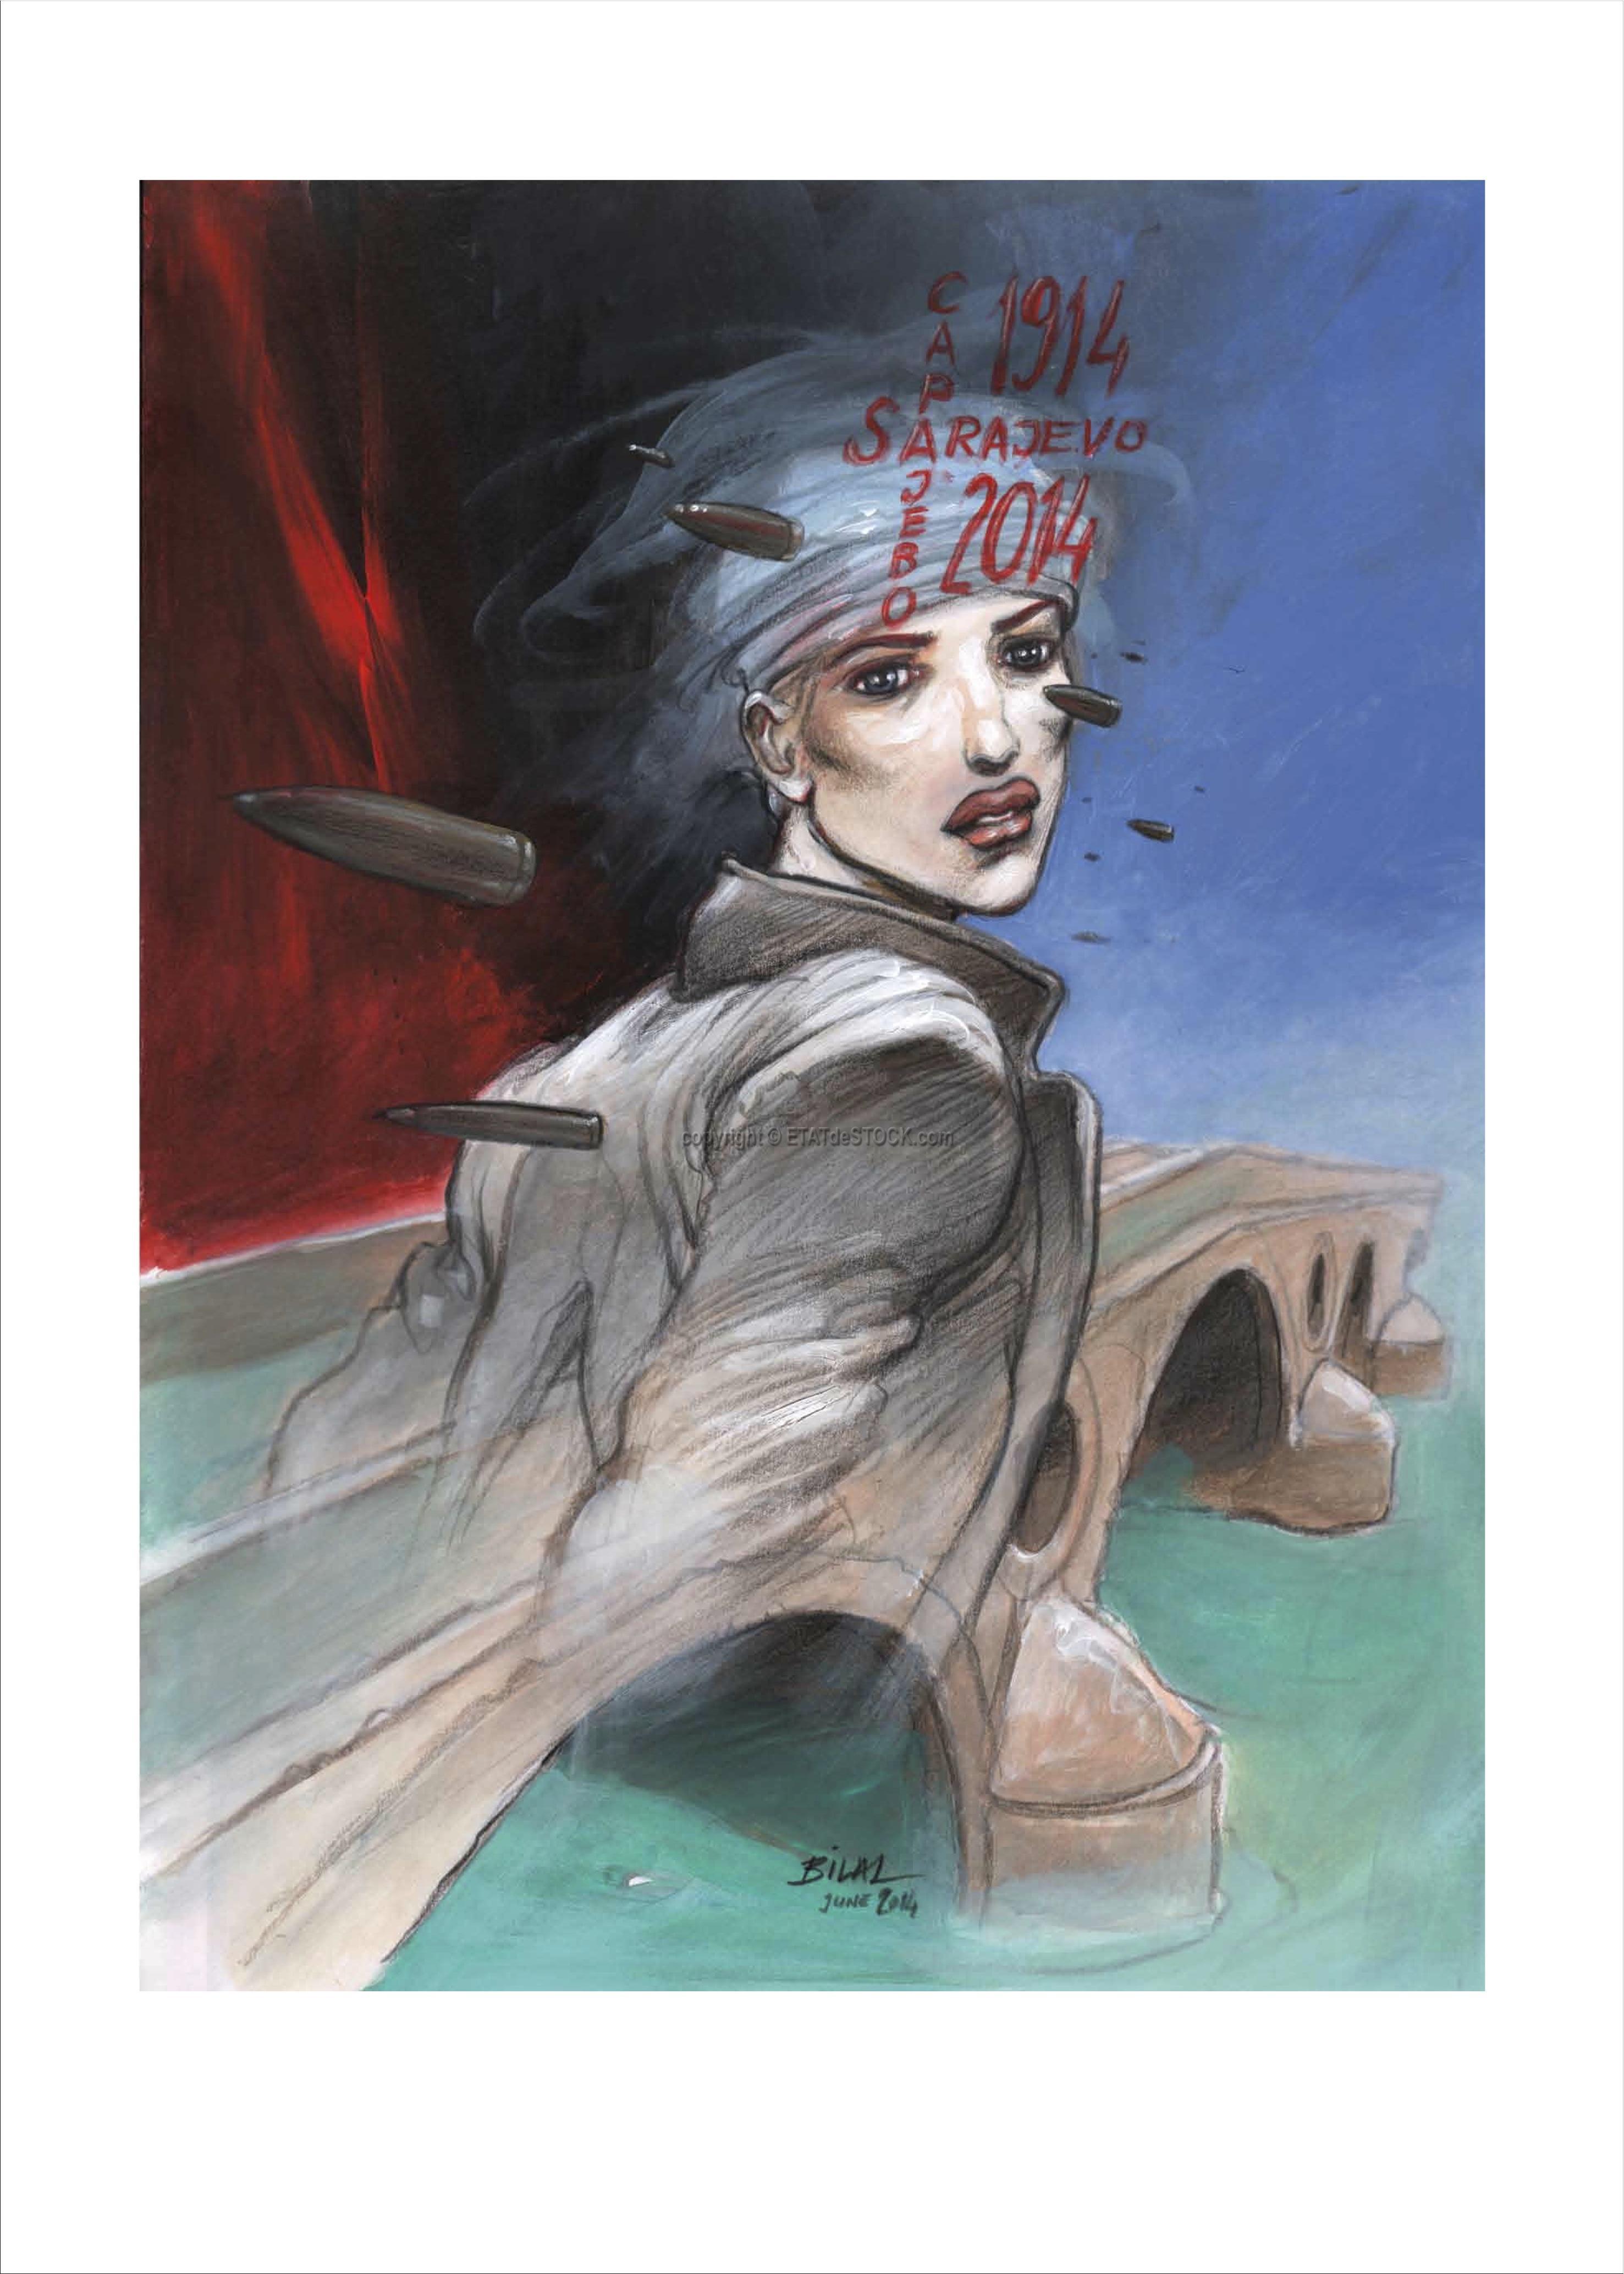 Enki Bilal Sarajevo 2014 Affiche  U00e9dition D U0026 39 Art Papier